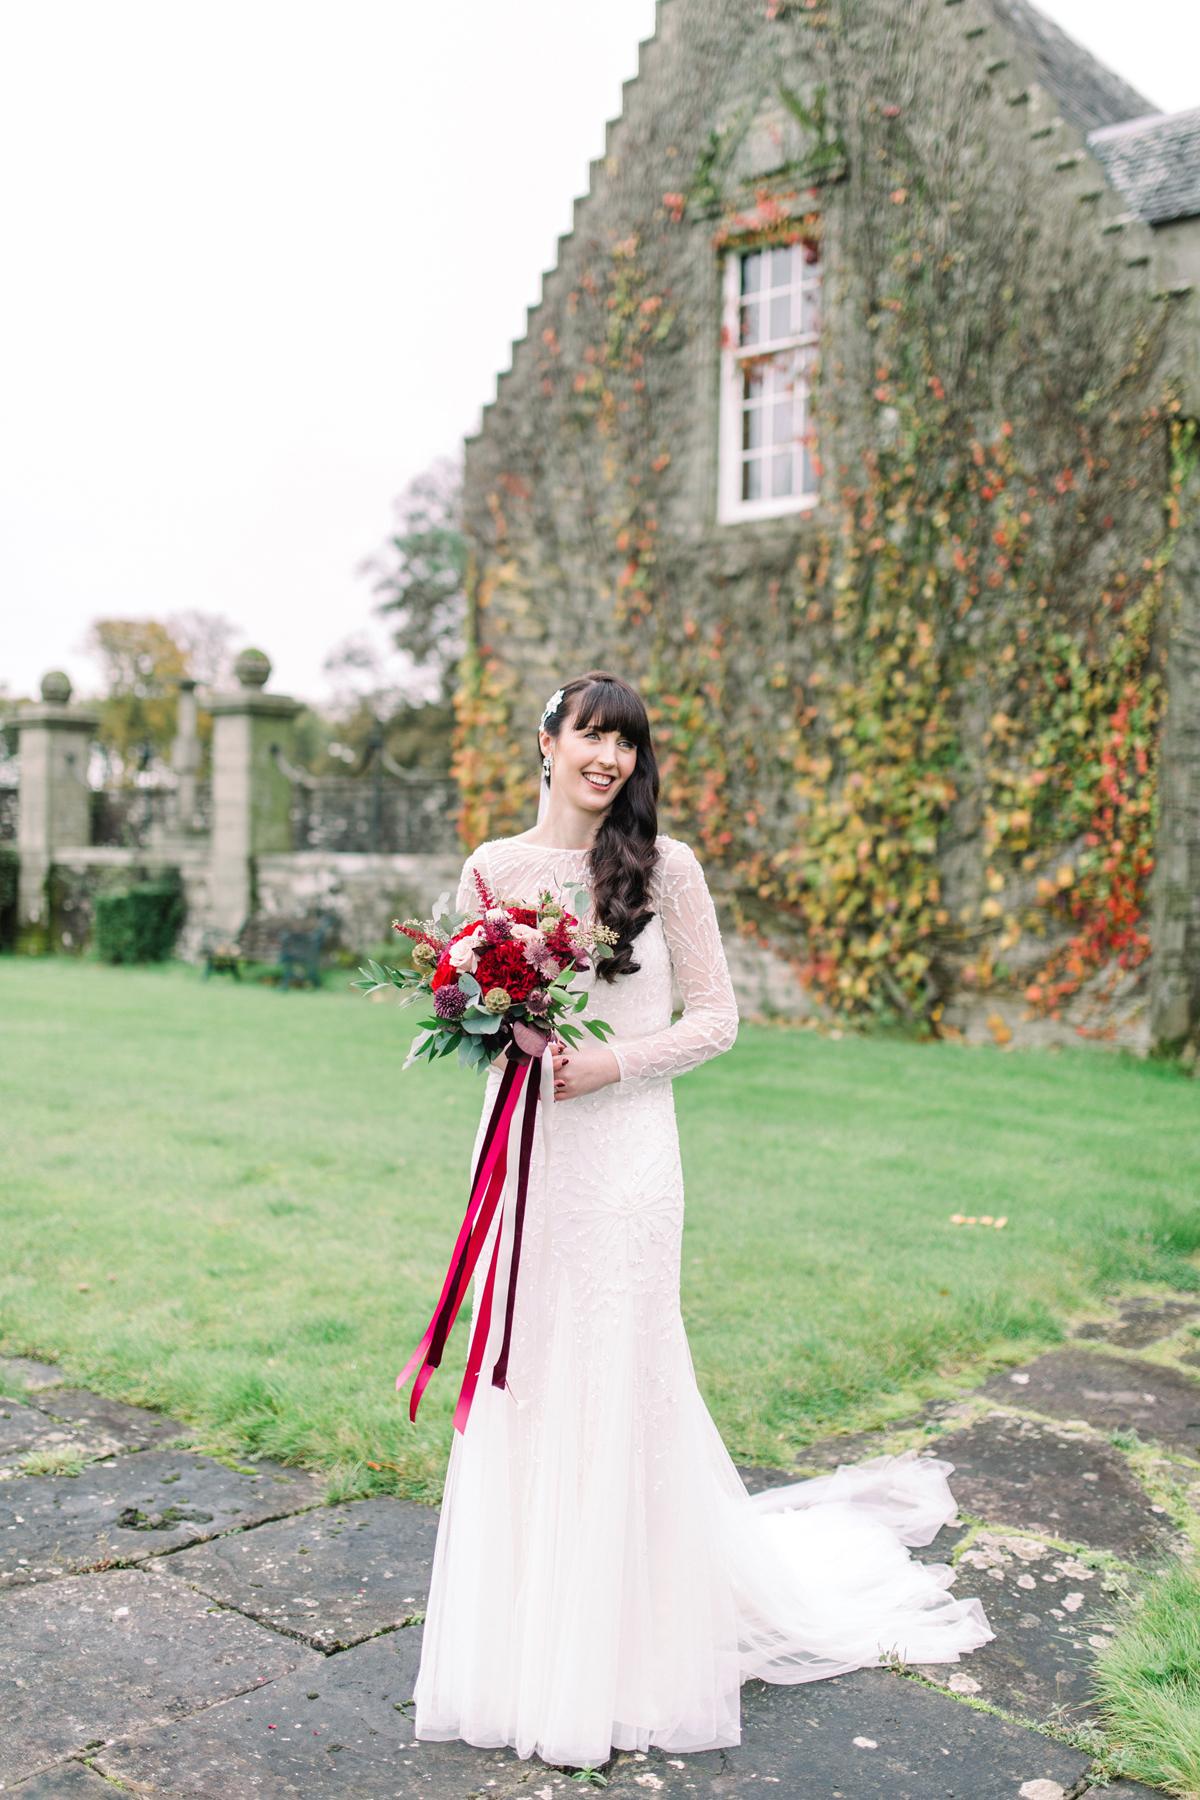 fcc841ac927 ... Rowallan Castle wedding - A Rosa Clara Gown for a Scottish Castle  Wedding in the Autumn ...